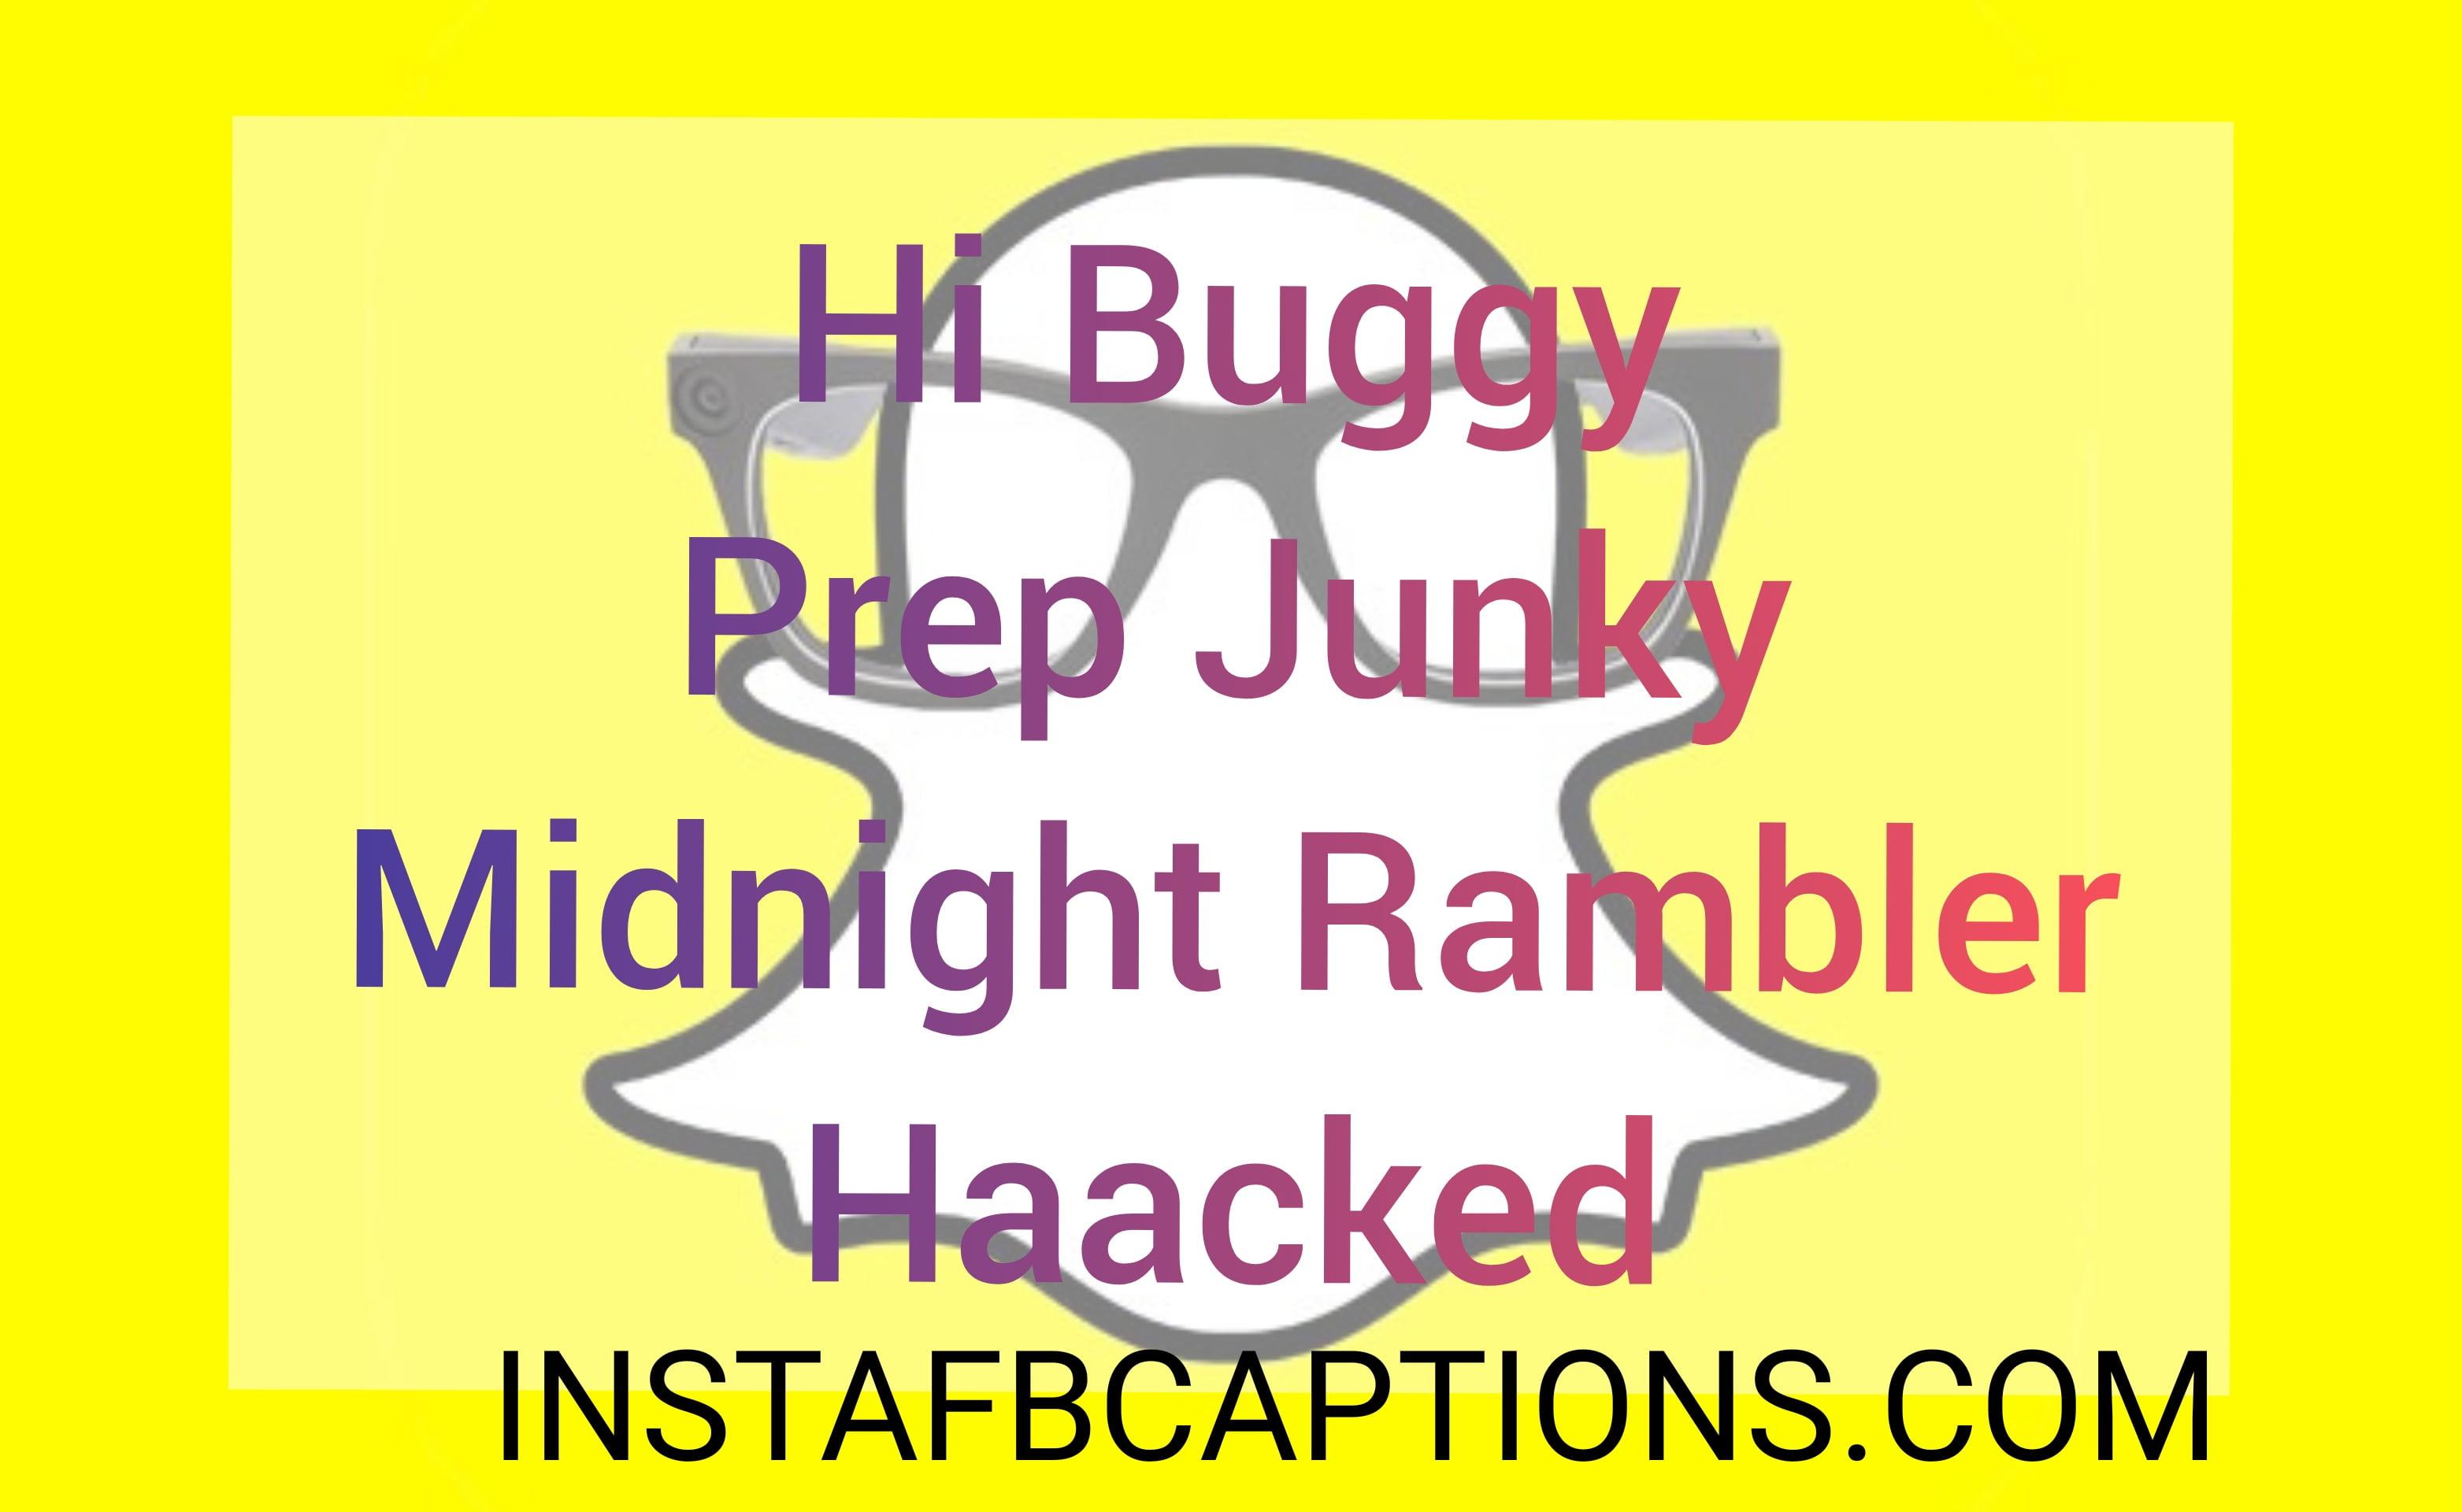 Techie Snapchat Names  - Techie snapchat names - 750+ Best SNAPCHAT NAME IDEAS for Guys & Girls 2021